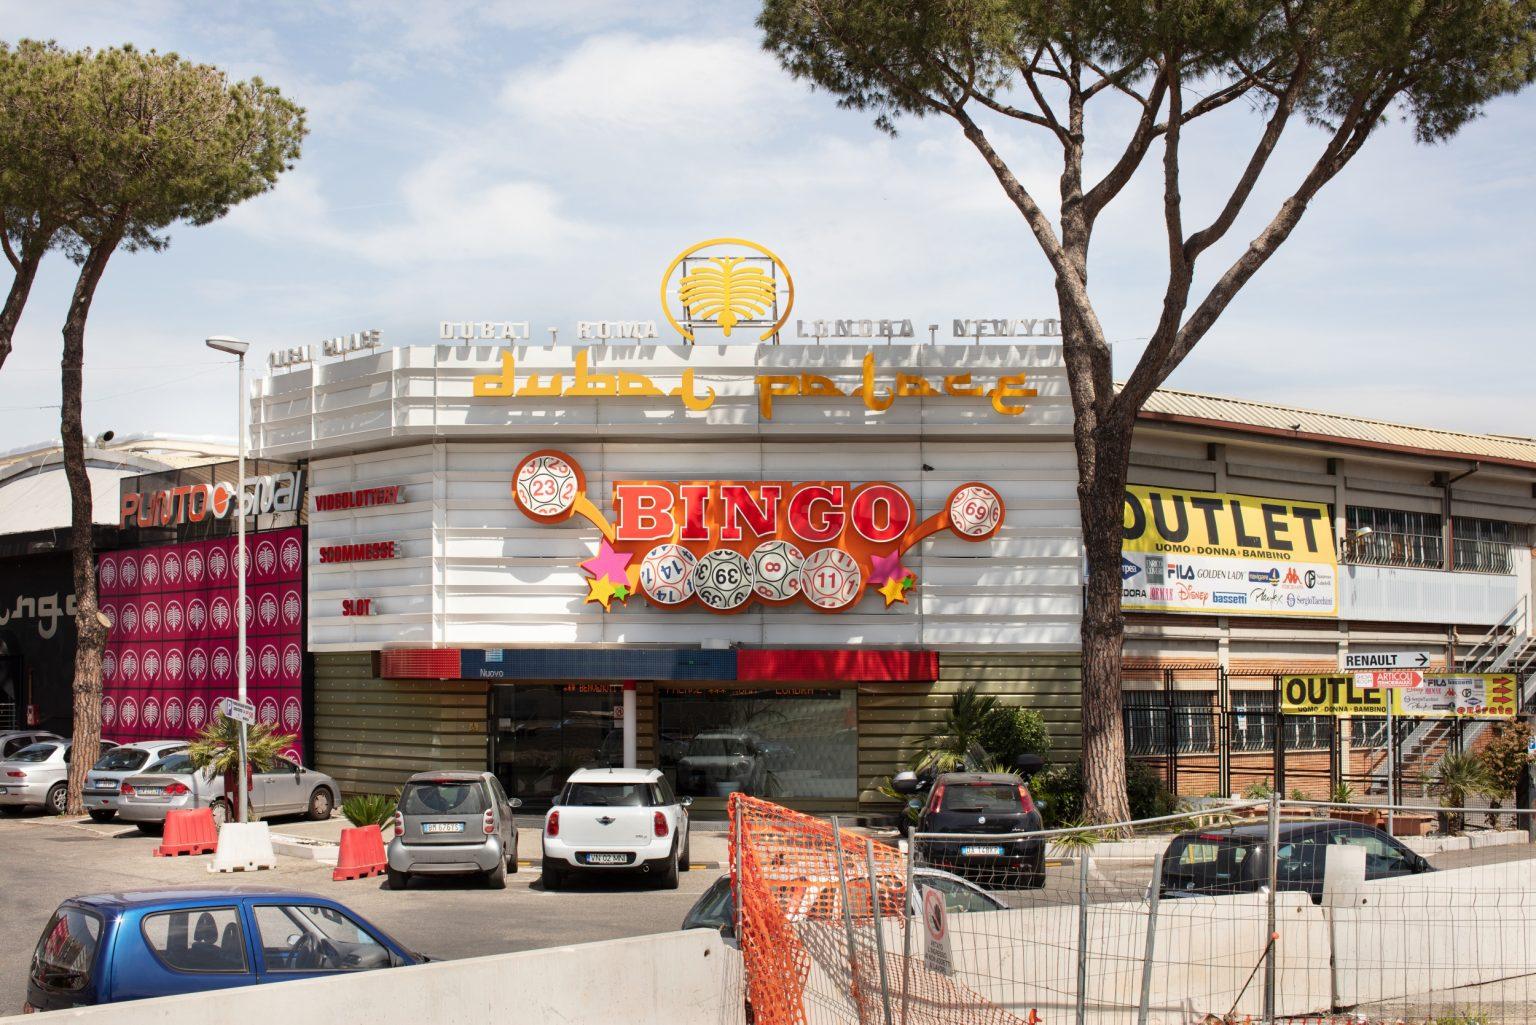 Via Tiburtina, suburb. Rome, Italy, 2016